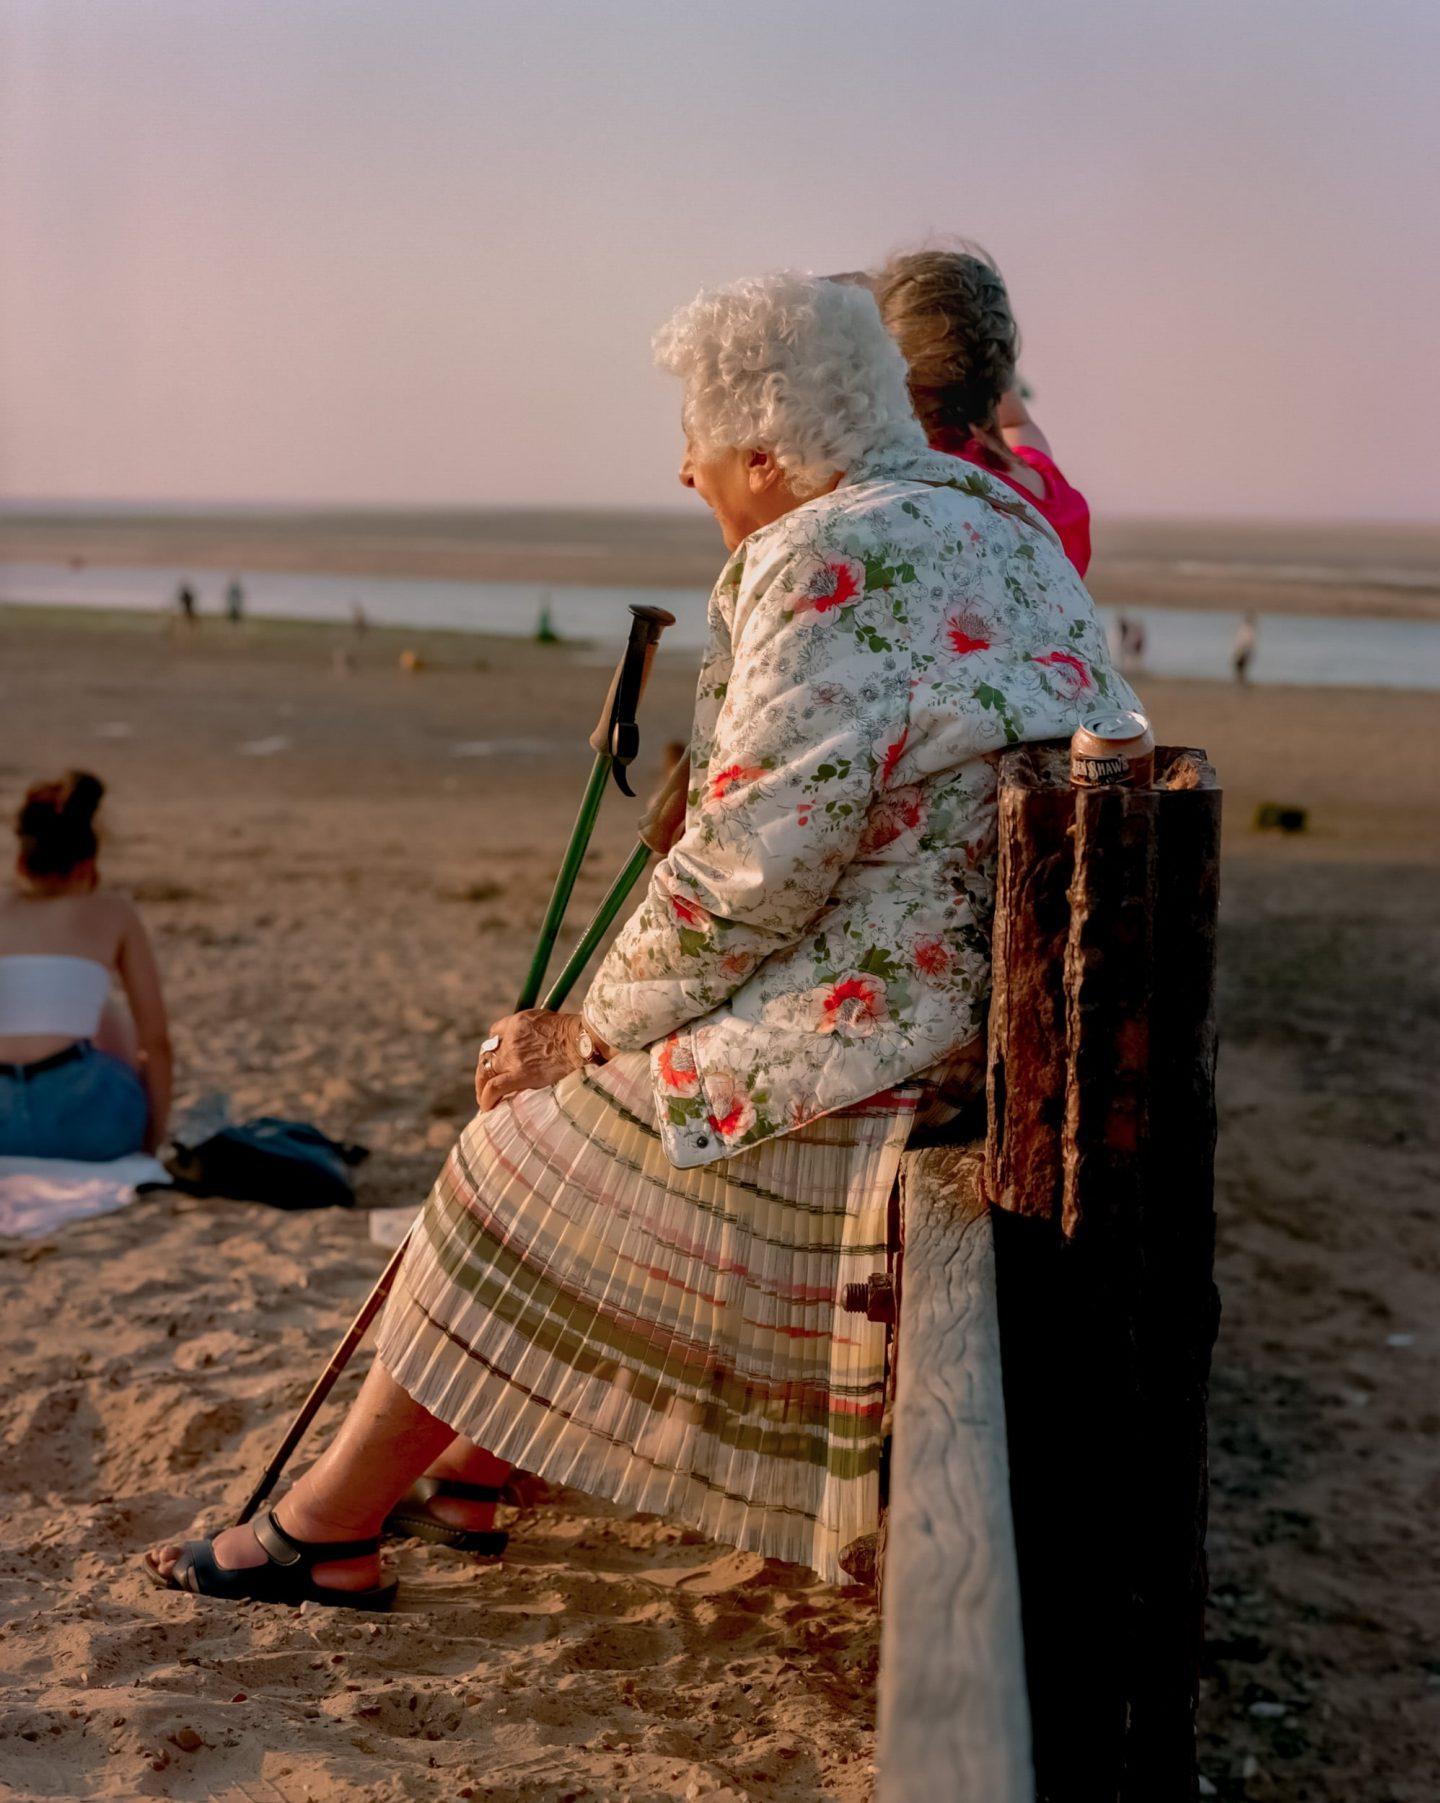 IGNANT-Photography-Max-Miechowski-02